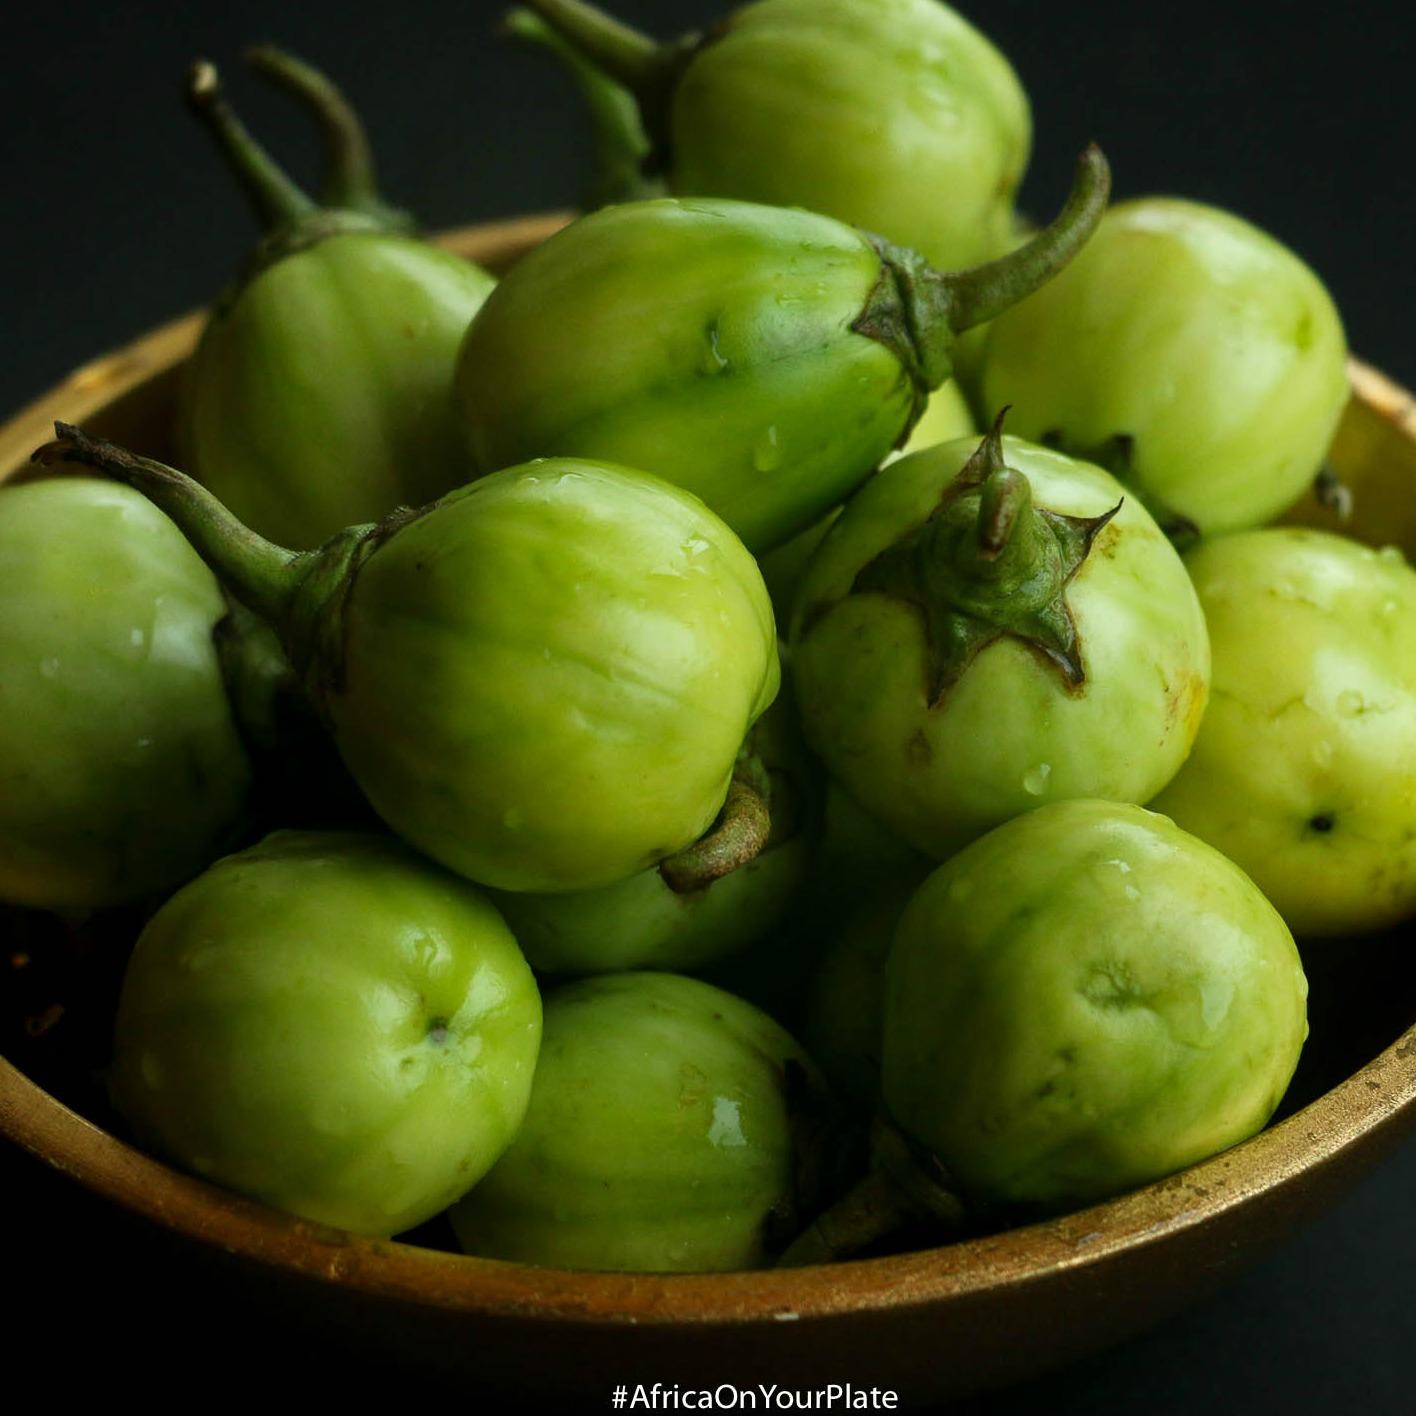 African-Eggplant-GardenEgg